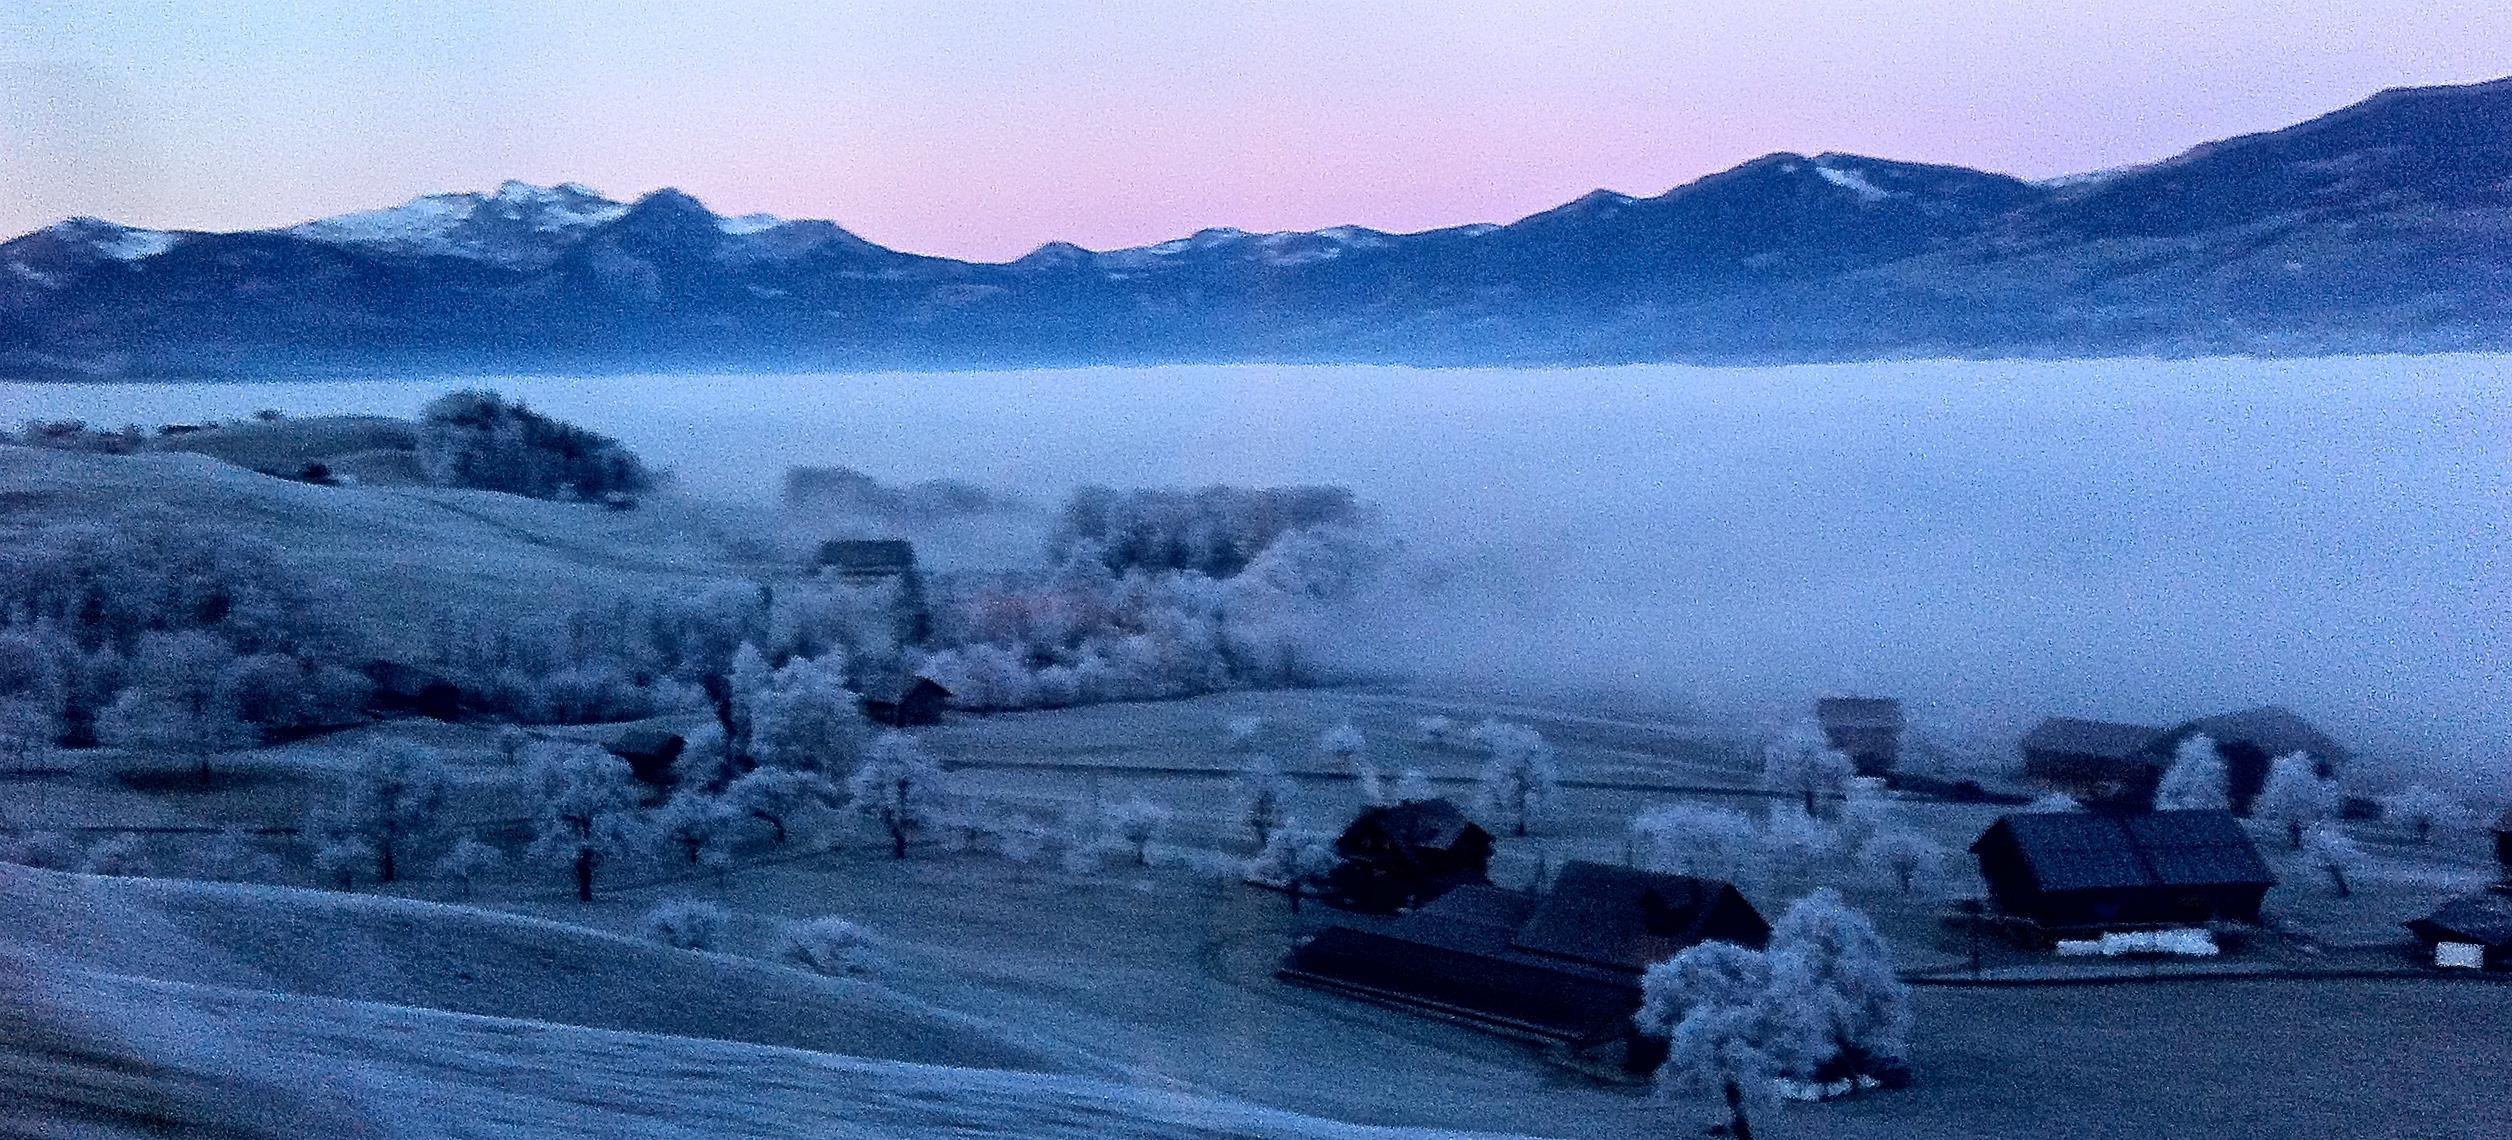 Giächt und Nebelmeer